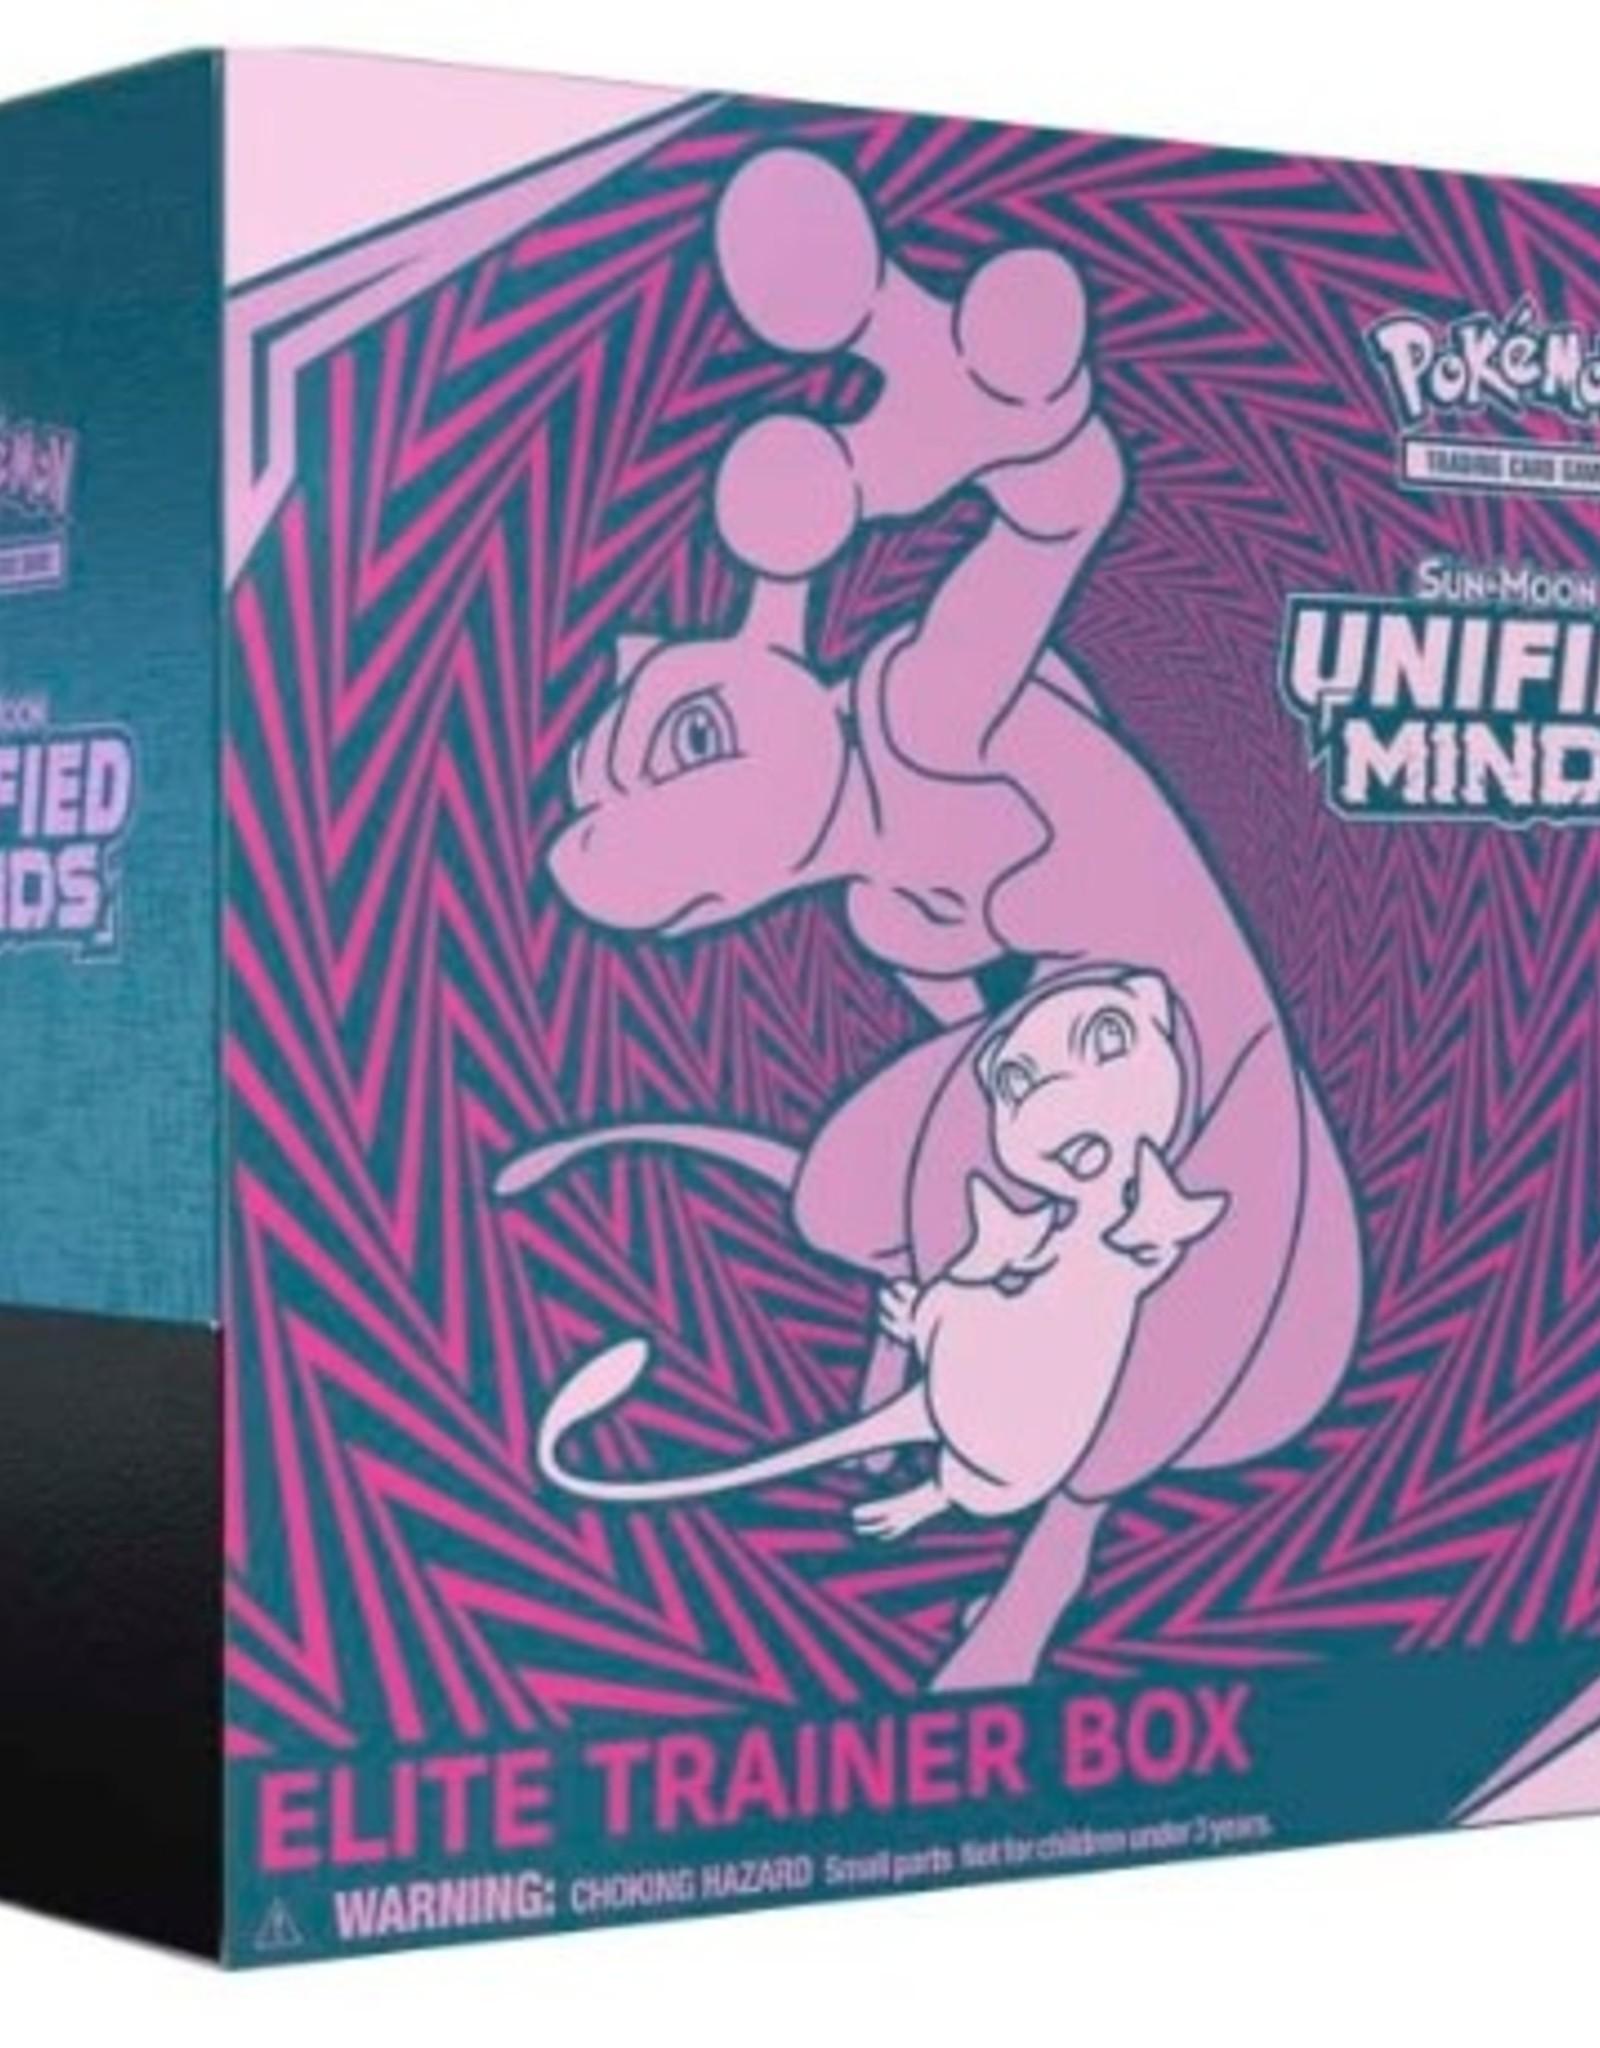 Pokemon Pokemon Unified Minds Elite Trainer Box